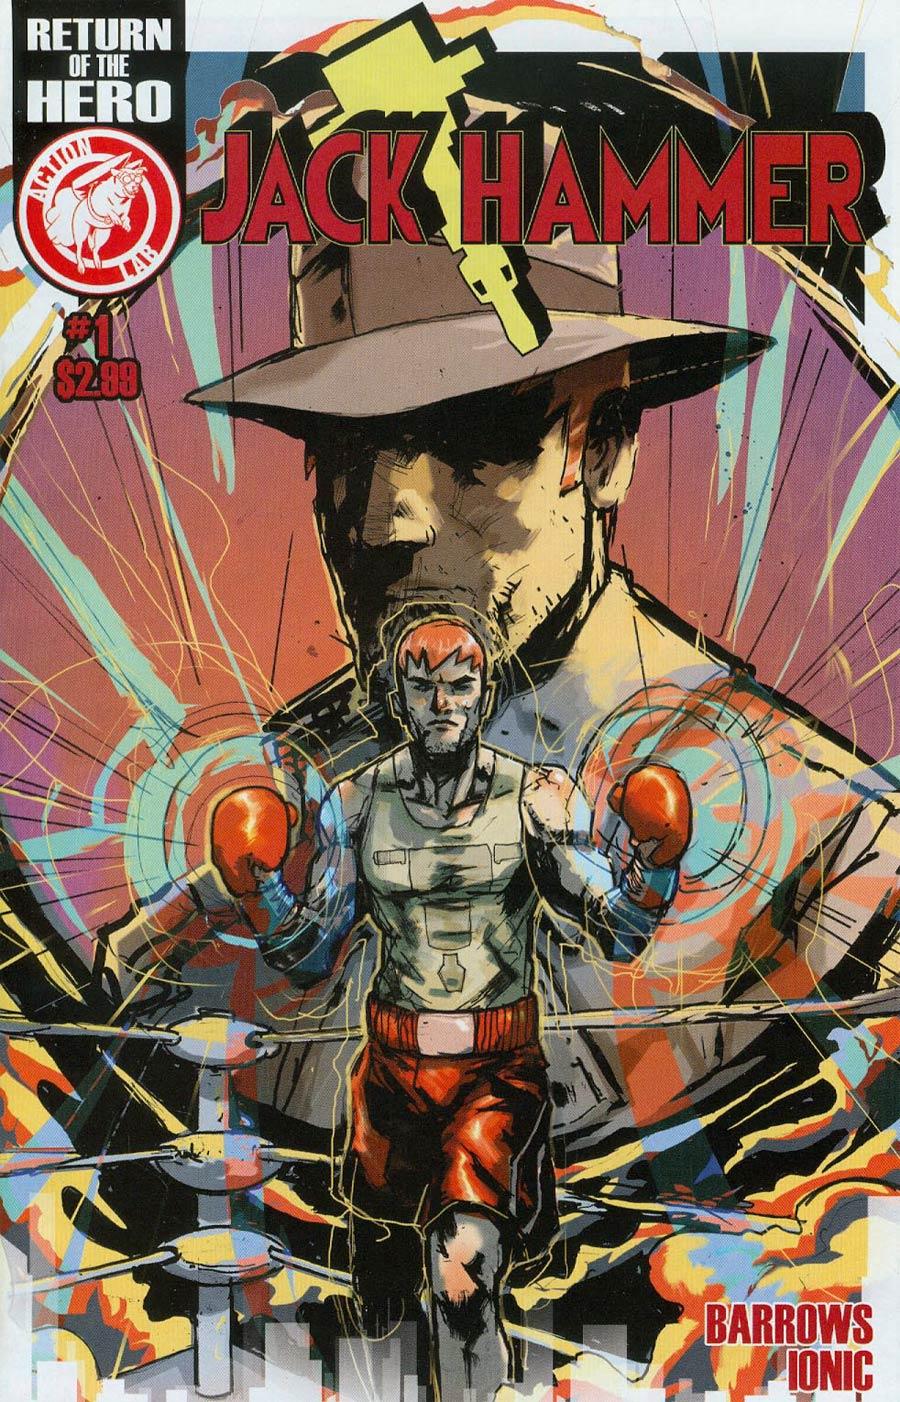 Jack Hammer #1 Cover B Riley Rossmo